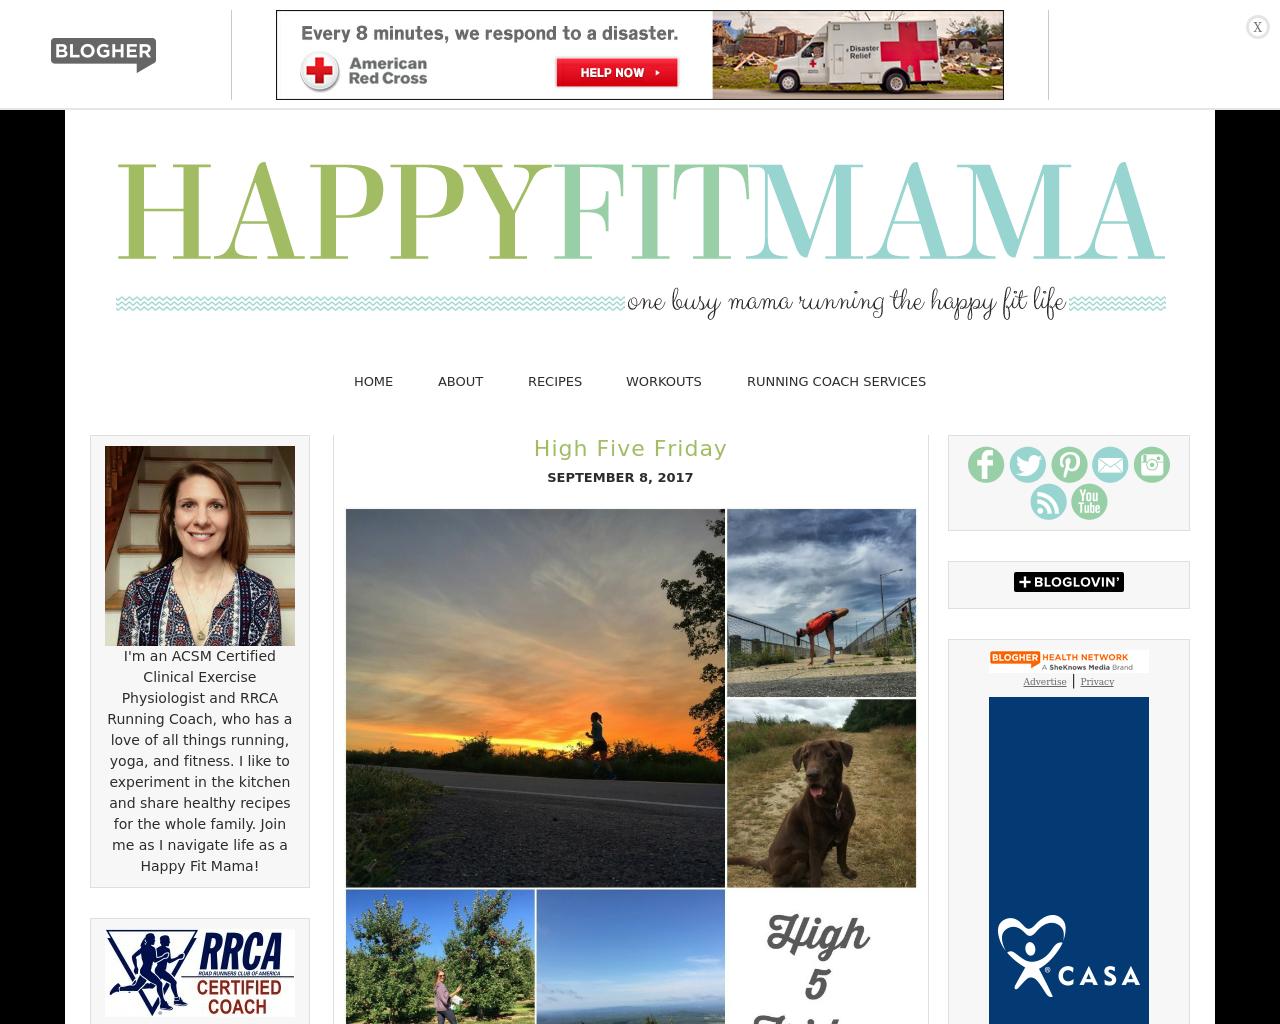 HAPPYFITMAMA-Advertising-Reviews-Pricing